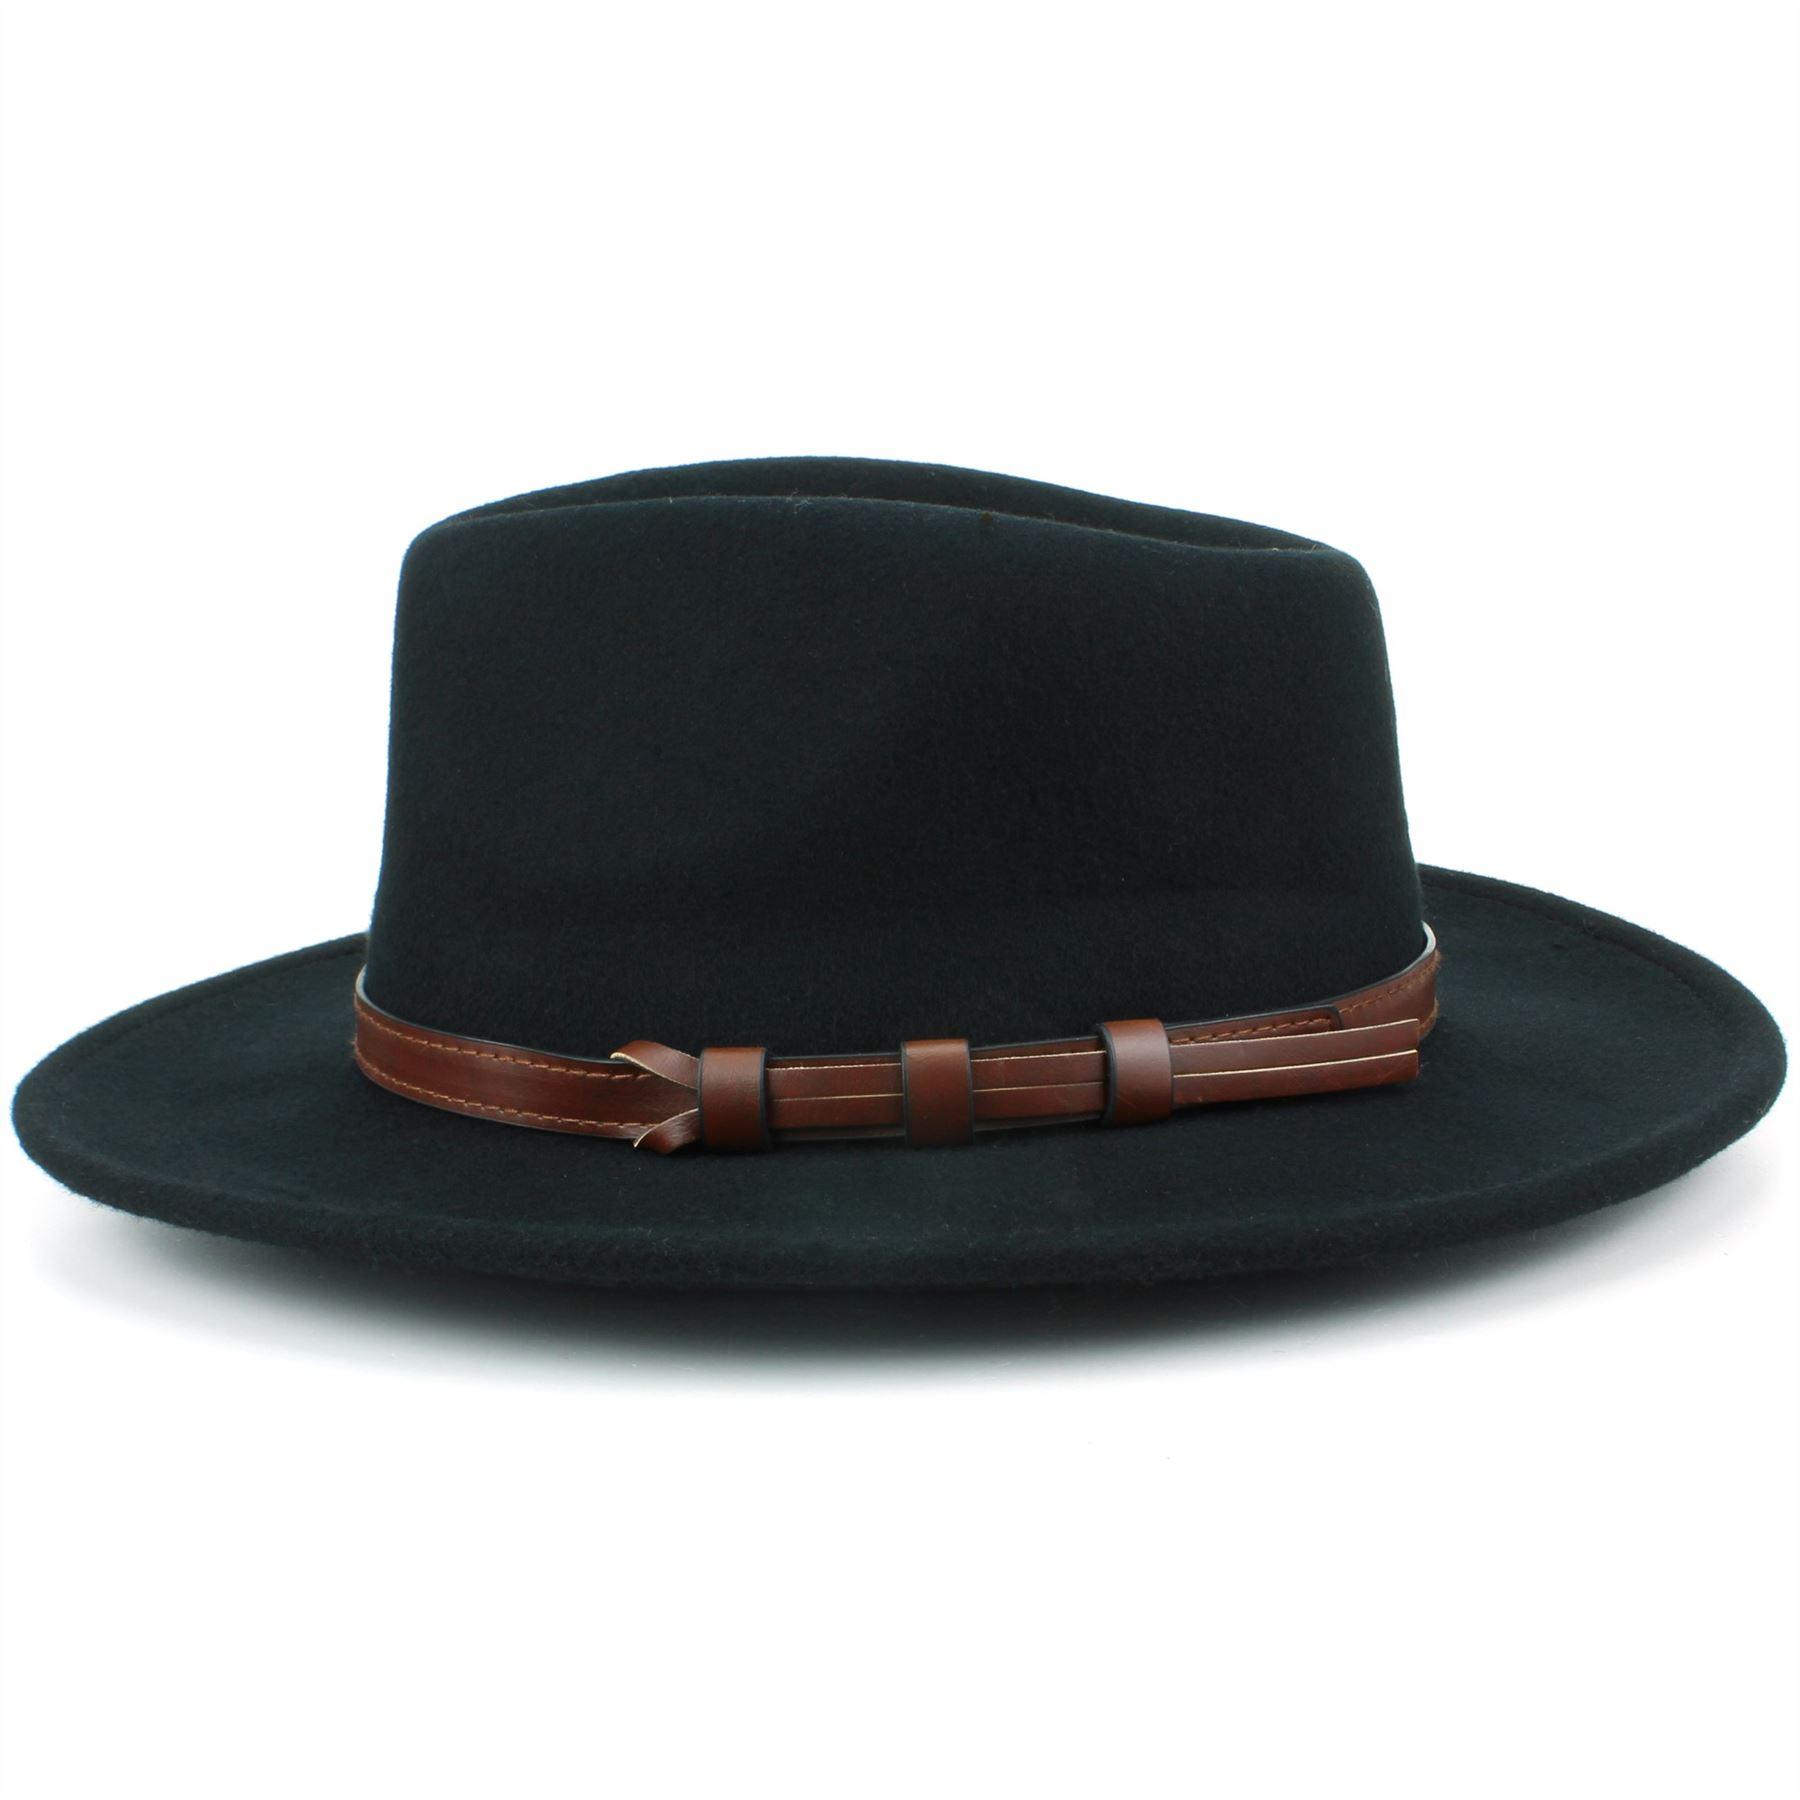 Fedora-Hat-Wool-BLACK-BROWN-Hawkins-Trilby-Brim-Mens-Ladies-Travel thumbnail 4